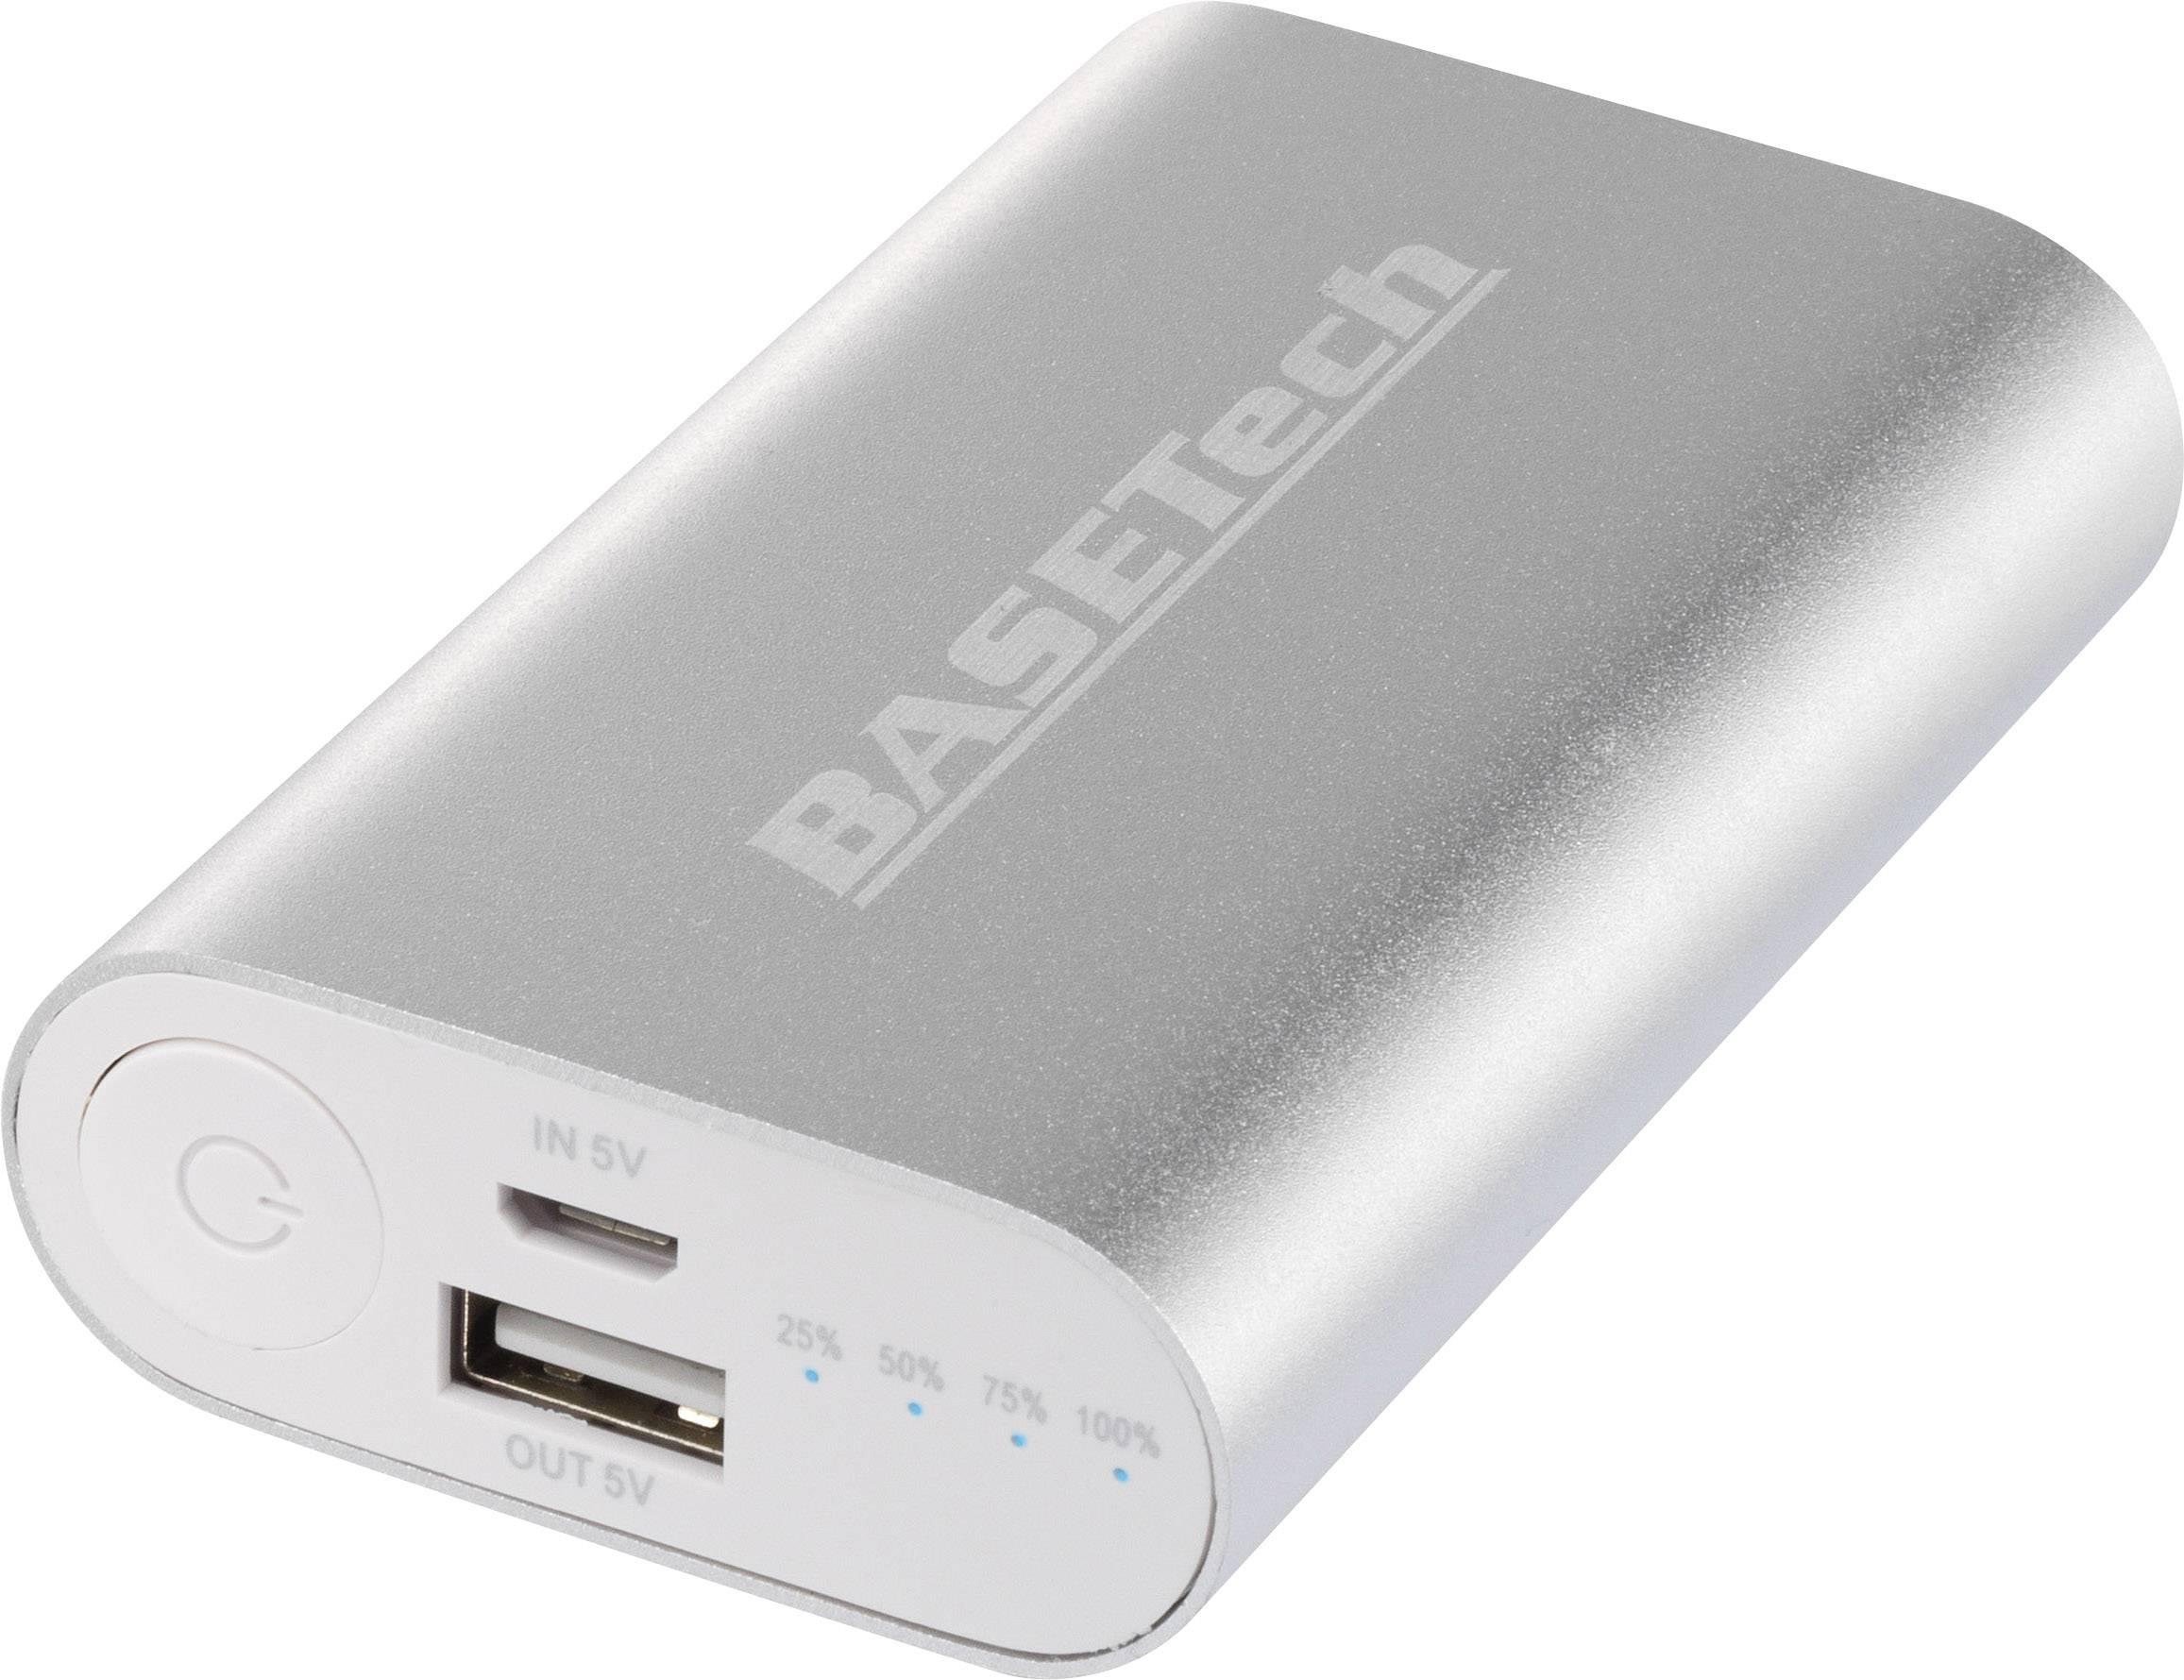 Powerbanka Basetech BTP-2, Li-Ion akumulátor 5200 mAh, stříbrná/bílá